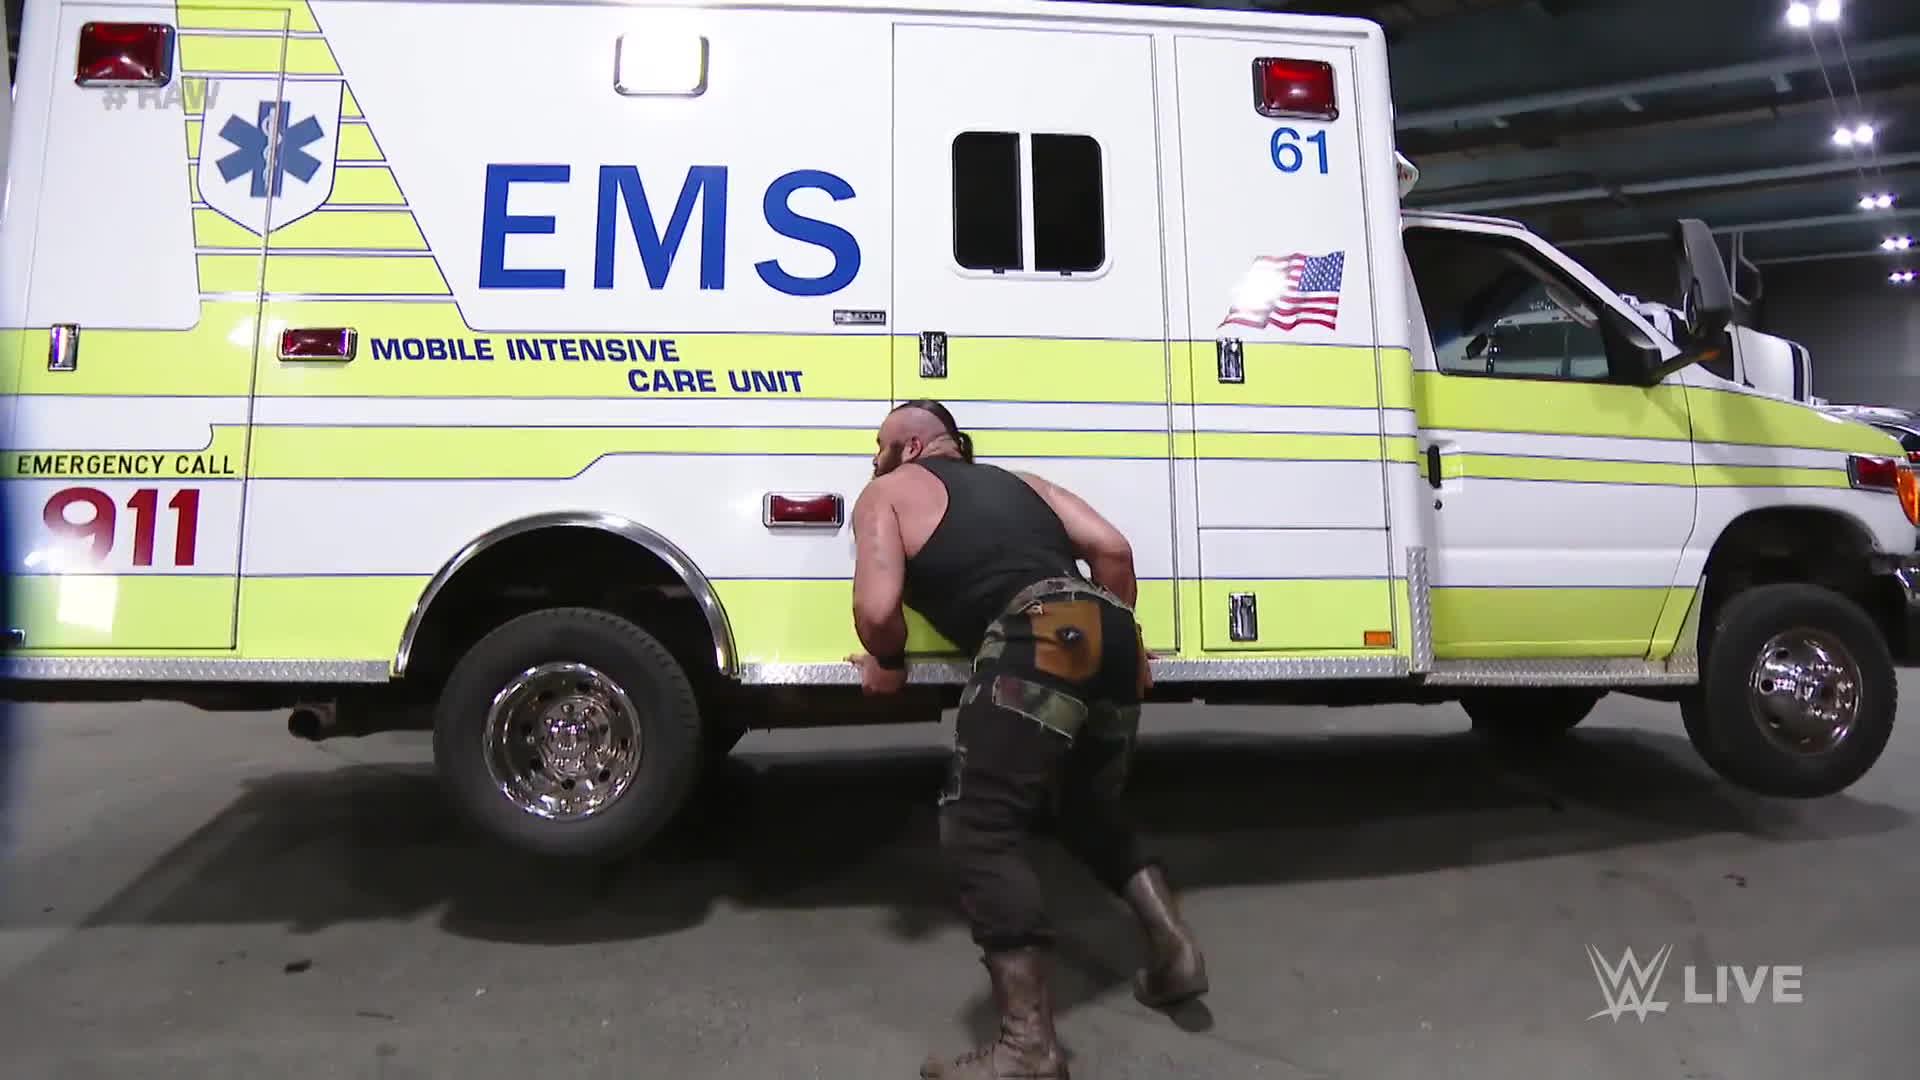 Weakpots, world wrestling entertainment, wwe, Braun Strowman savagely attacks Roman Reigns: Raw, April 10, 2017 GIFs